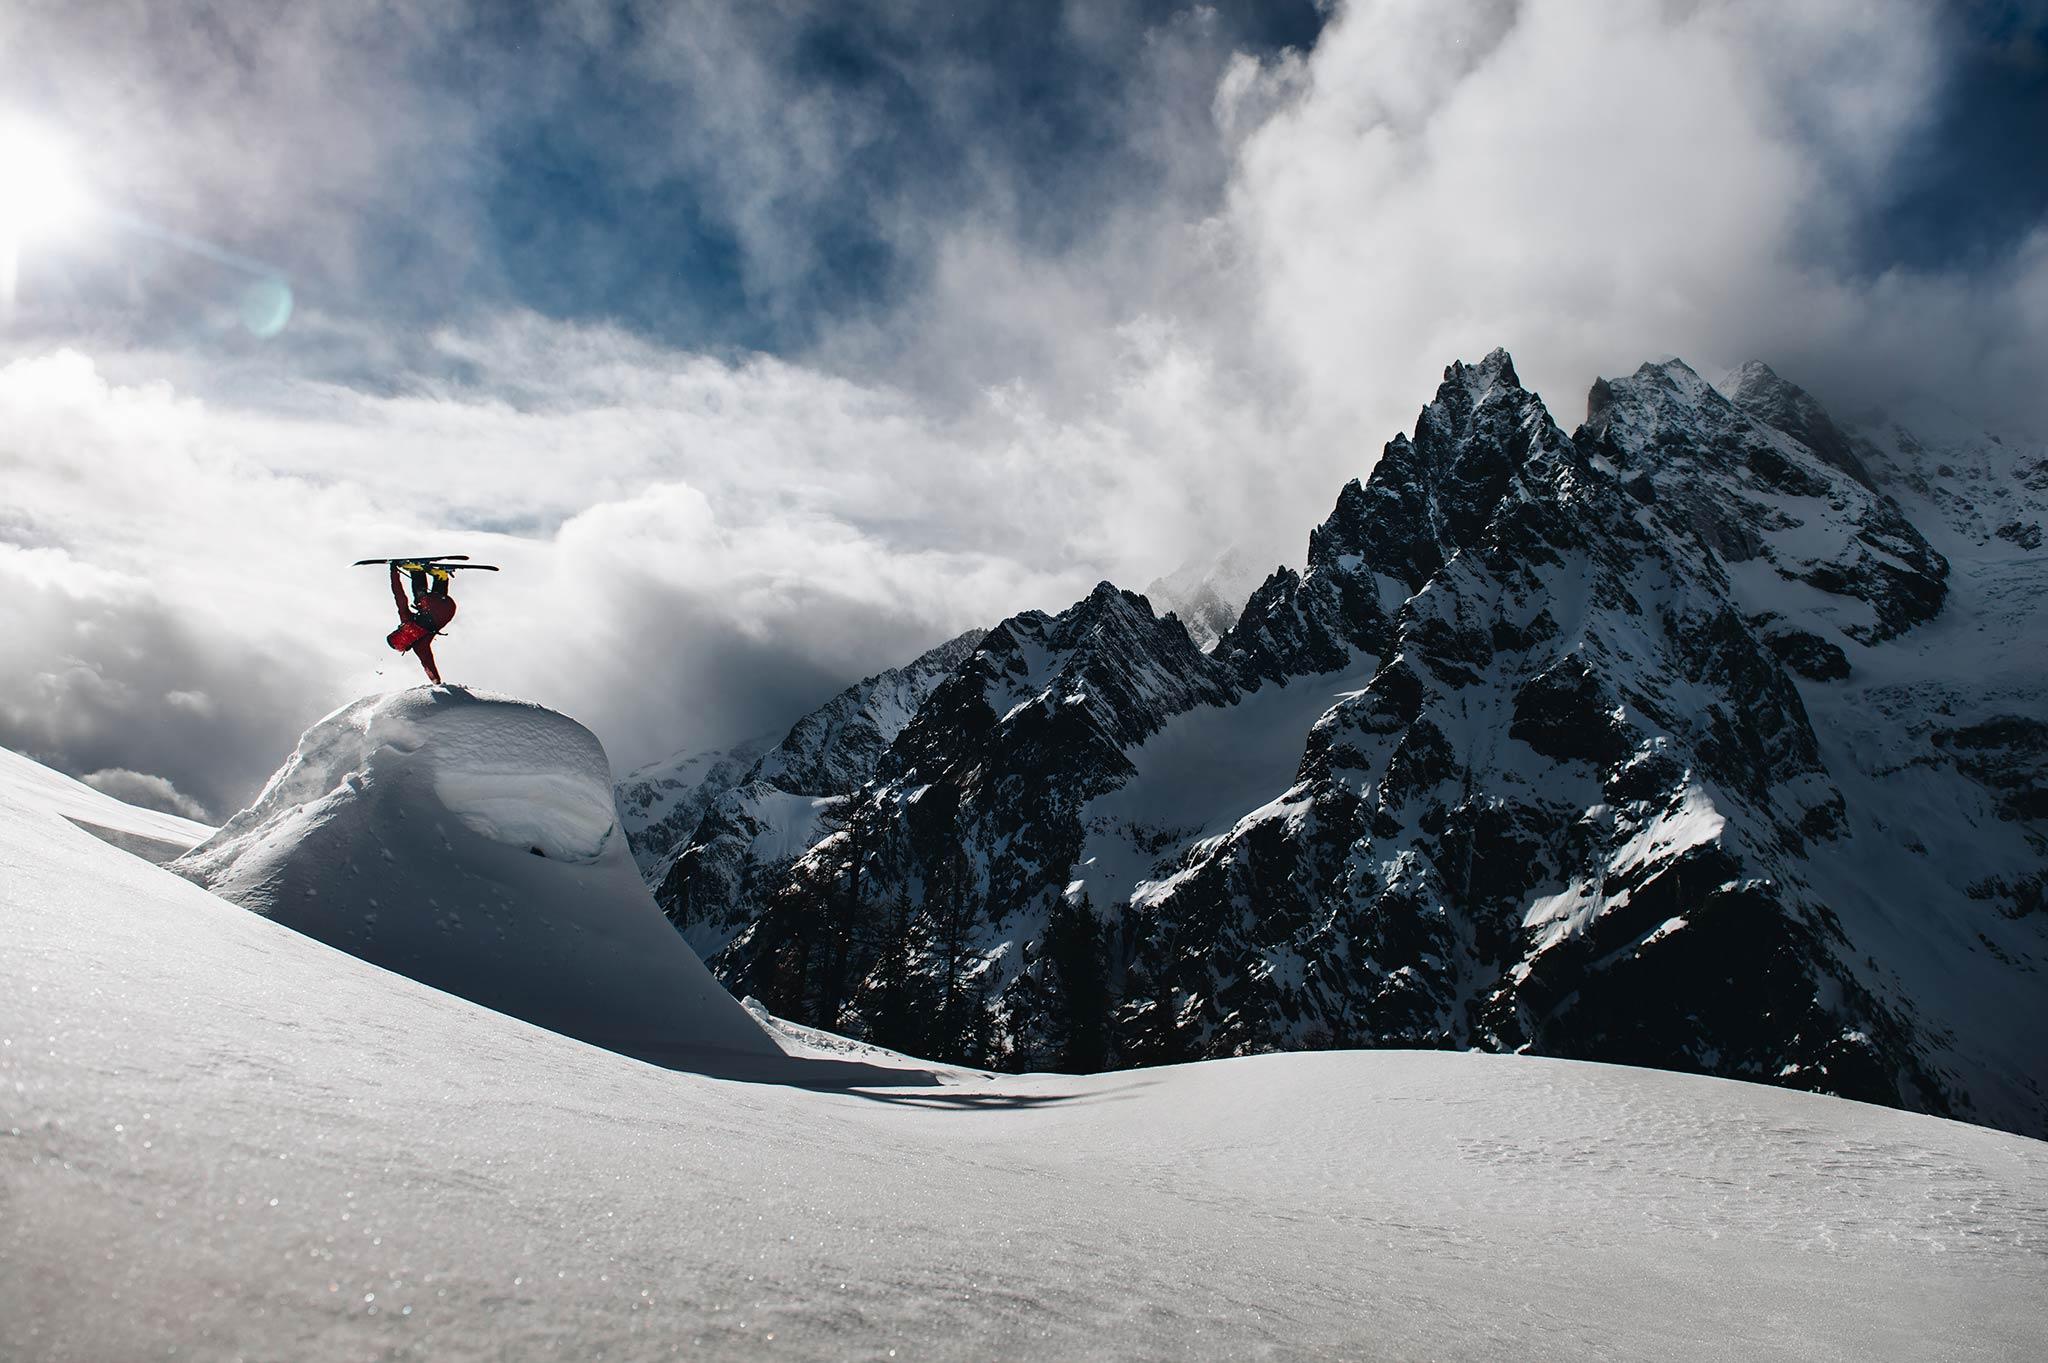 Best Action: Foto Adam Klingeteg, Rider William Larsson